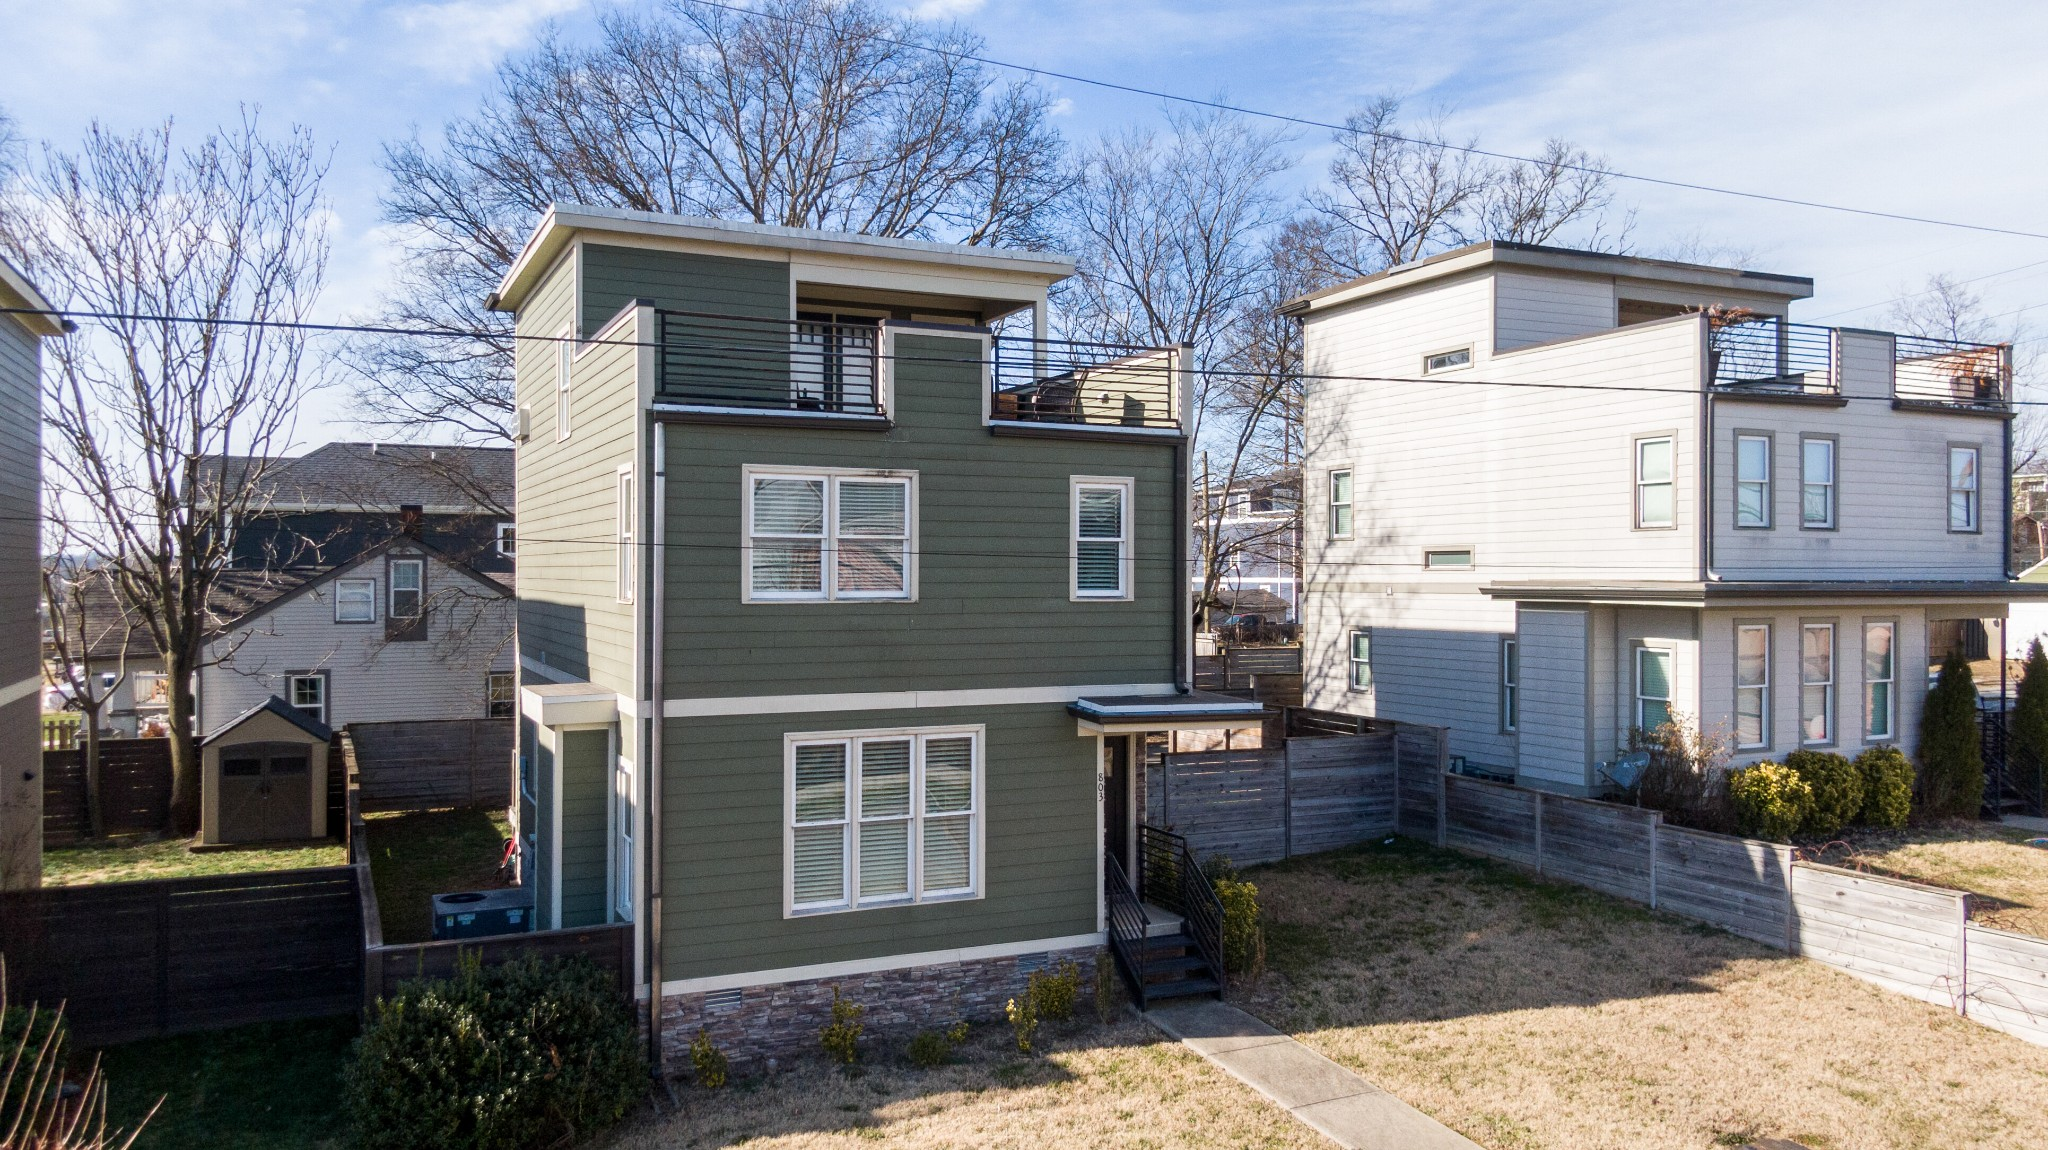 803 44th Ave N Property Photo - Nashville, TN real estate listing